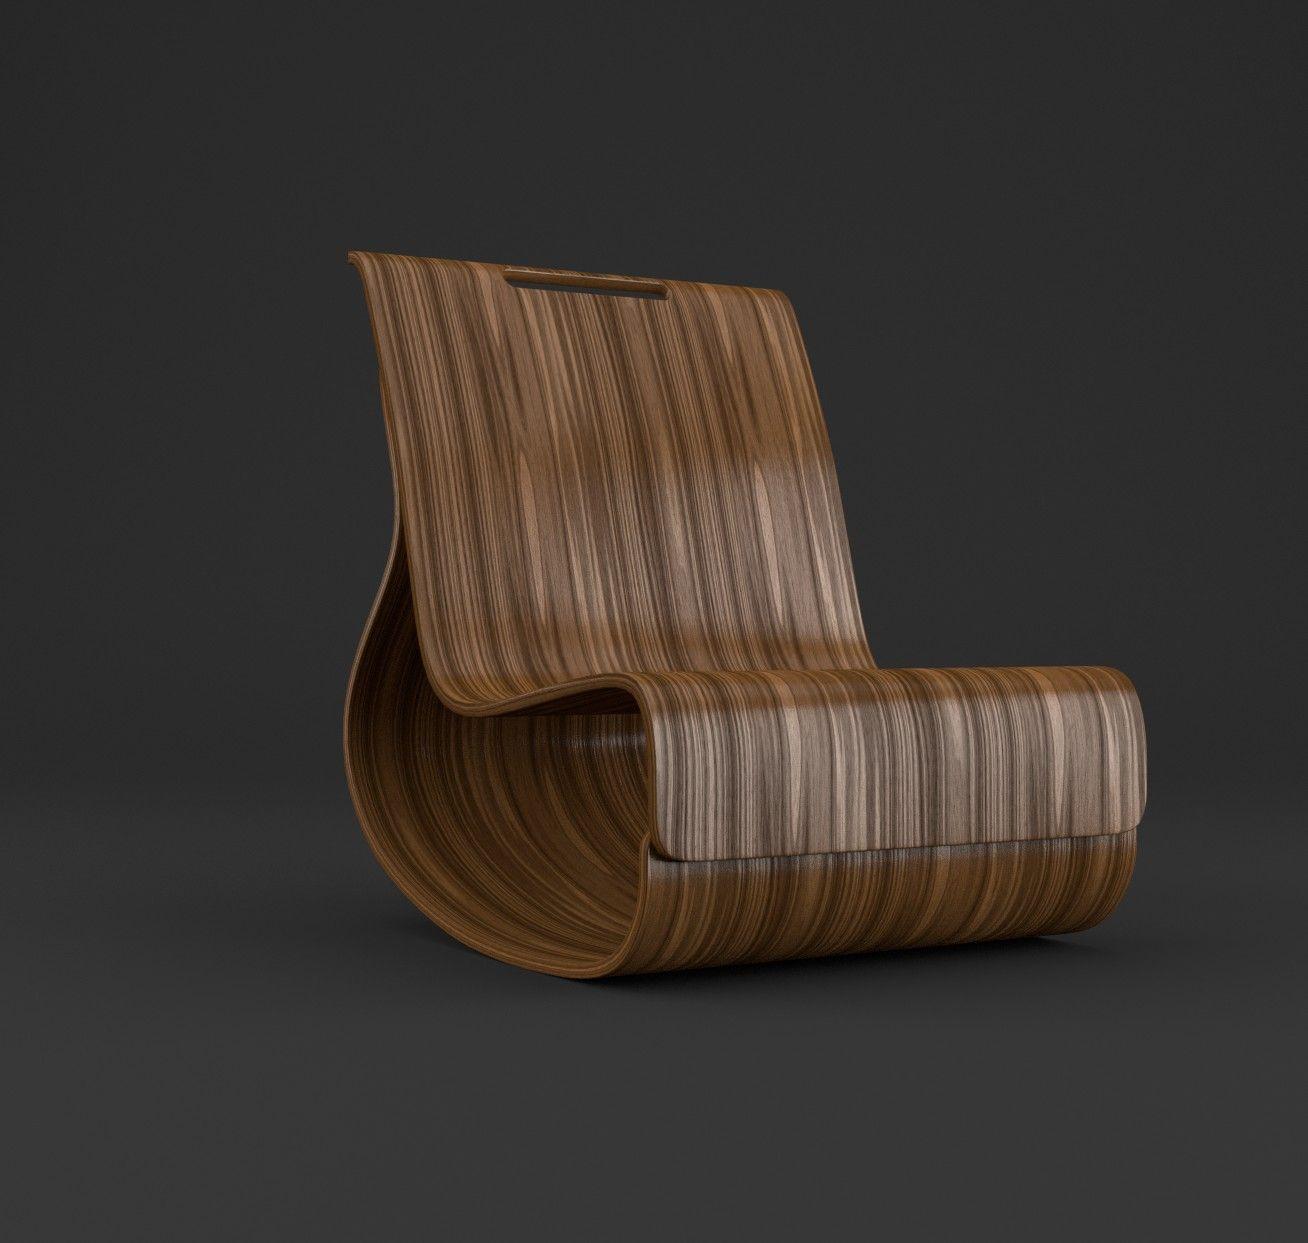 Sofas  Chairs  love Seat  6 Blender models   full textureSofas  Chairs  love Seat  6 Blender models   full texture  . Love Chairs Sofa. Home Design Ideas